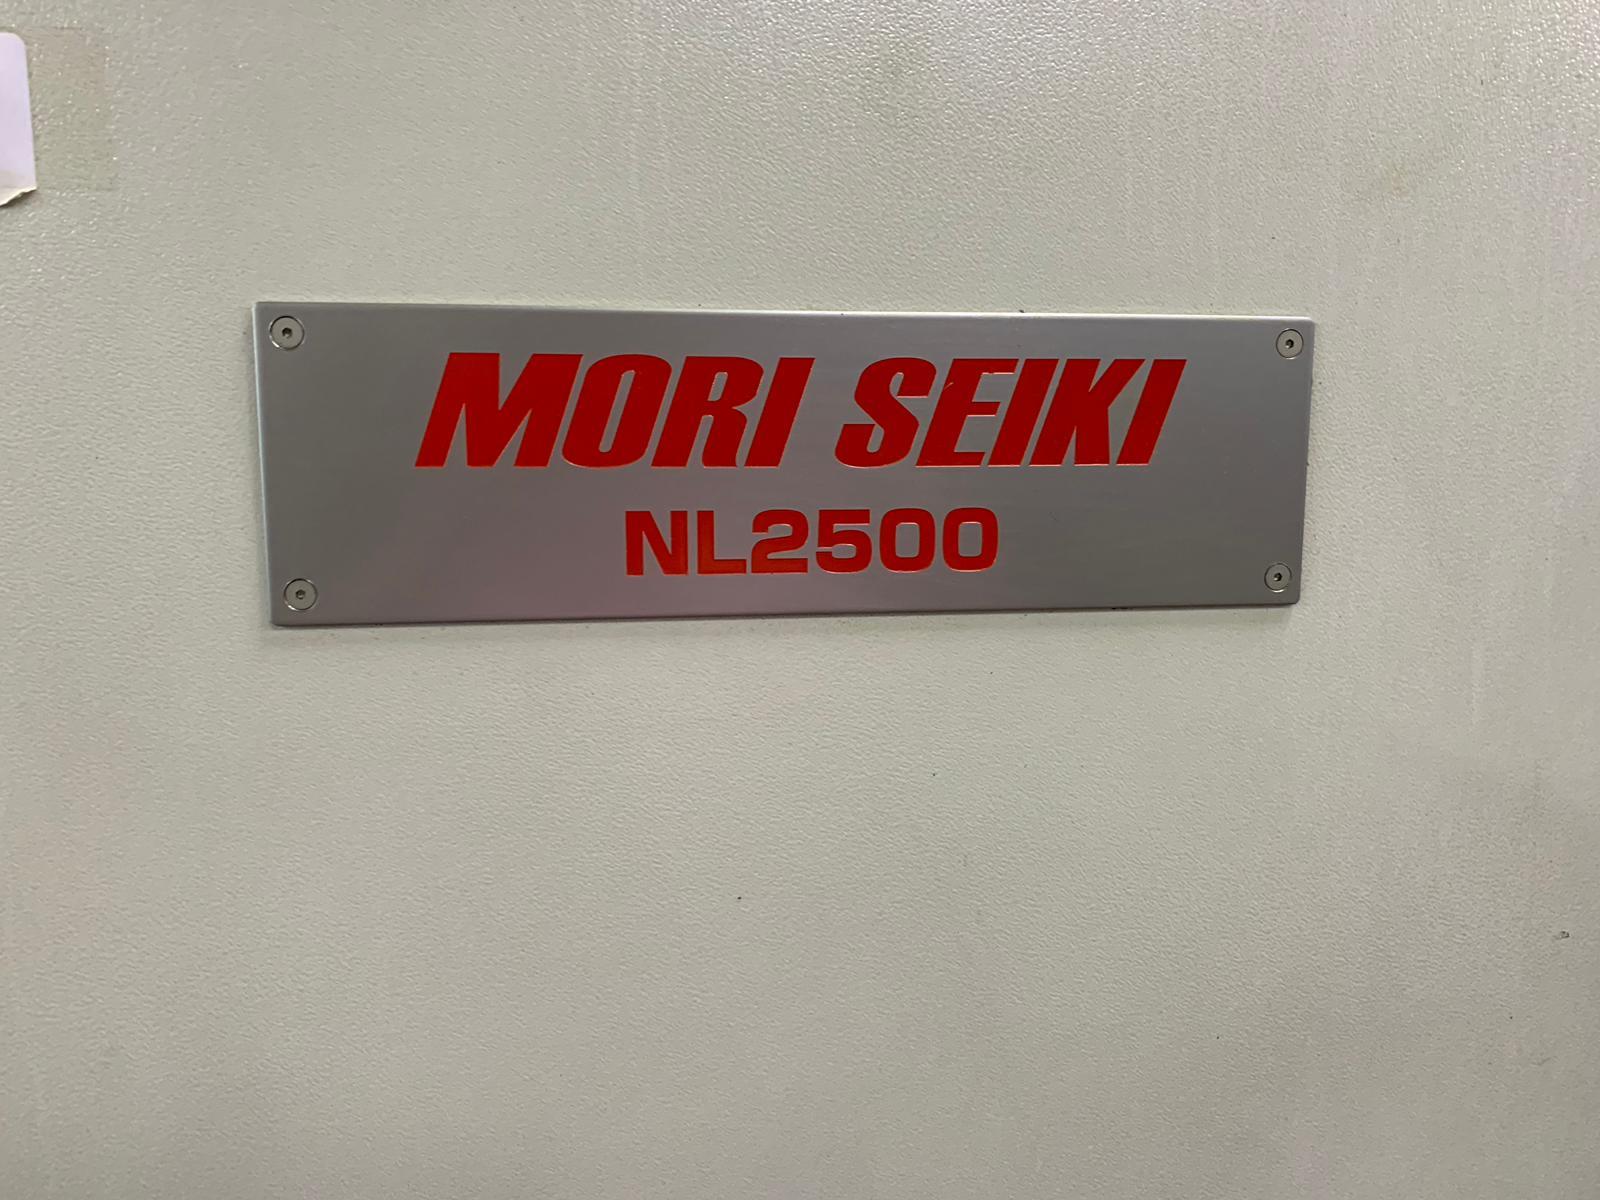 2006 MORI SEIKI NL2500Y/700 - CNC Horizontal Lathe